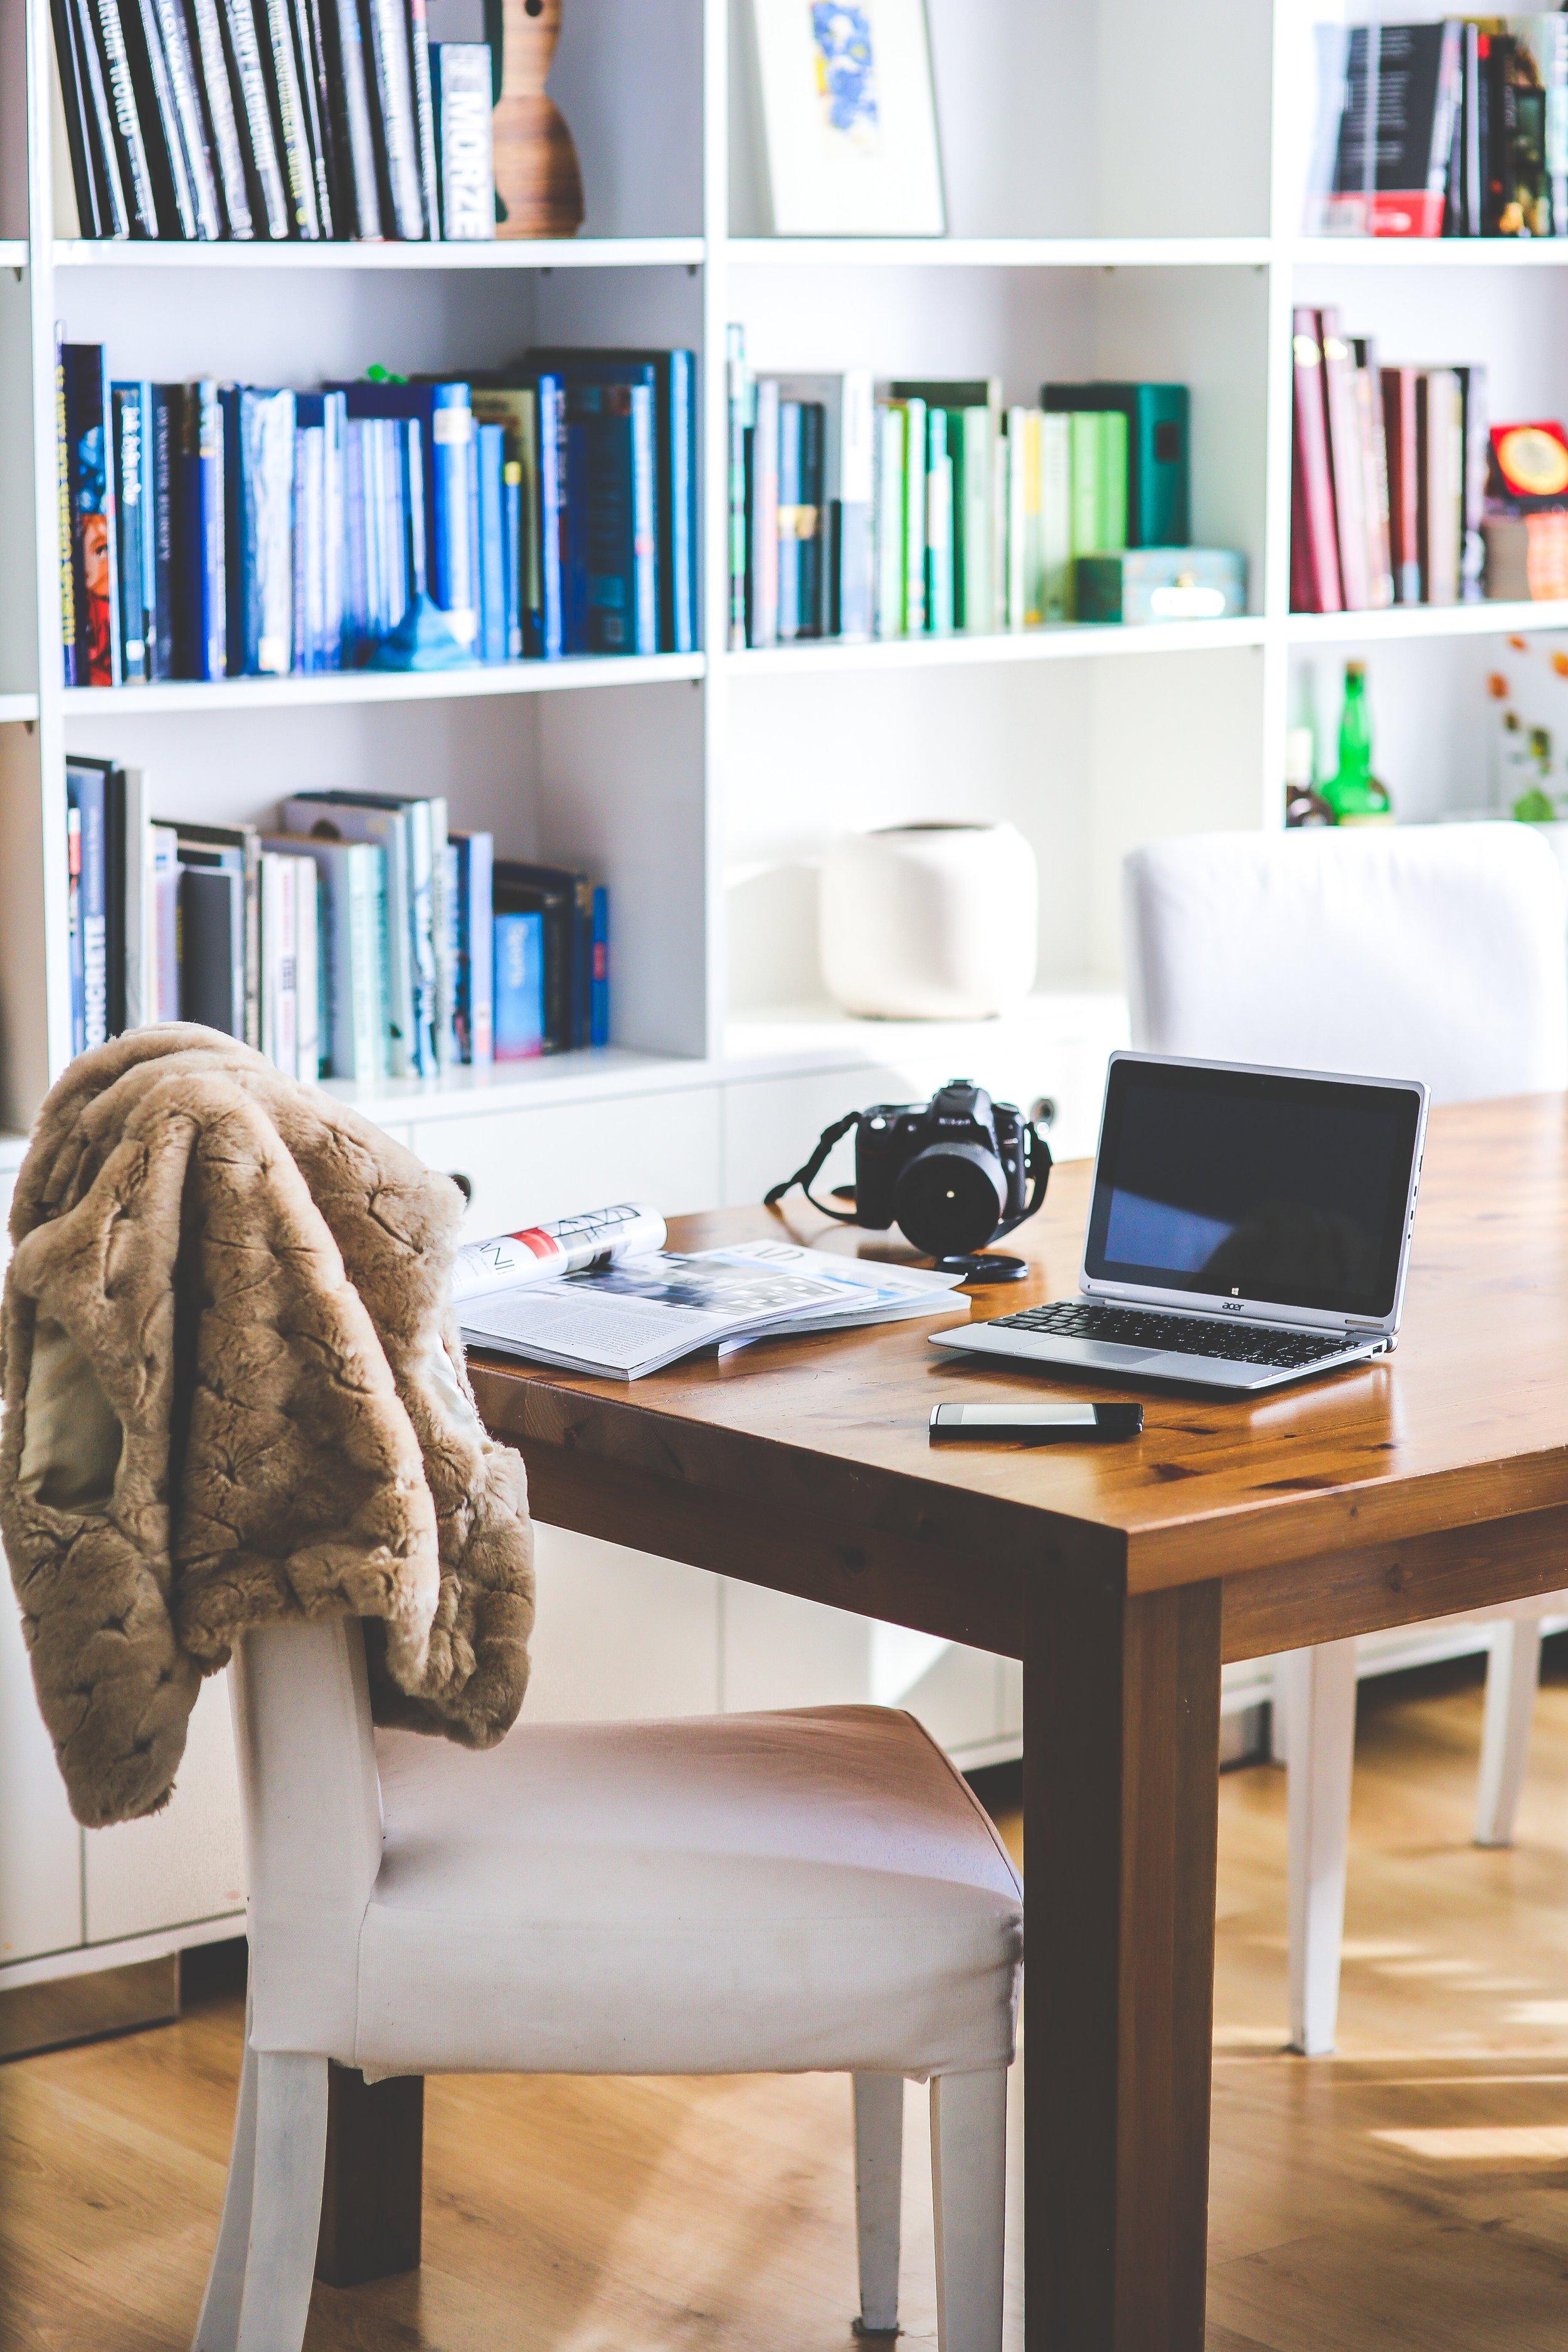 apartment-laptop-renters-insurance.jpg